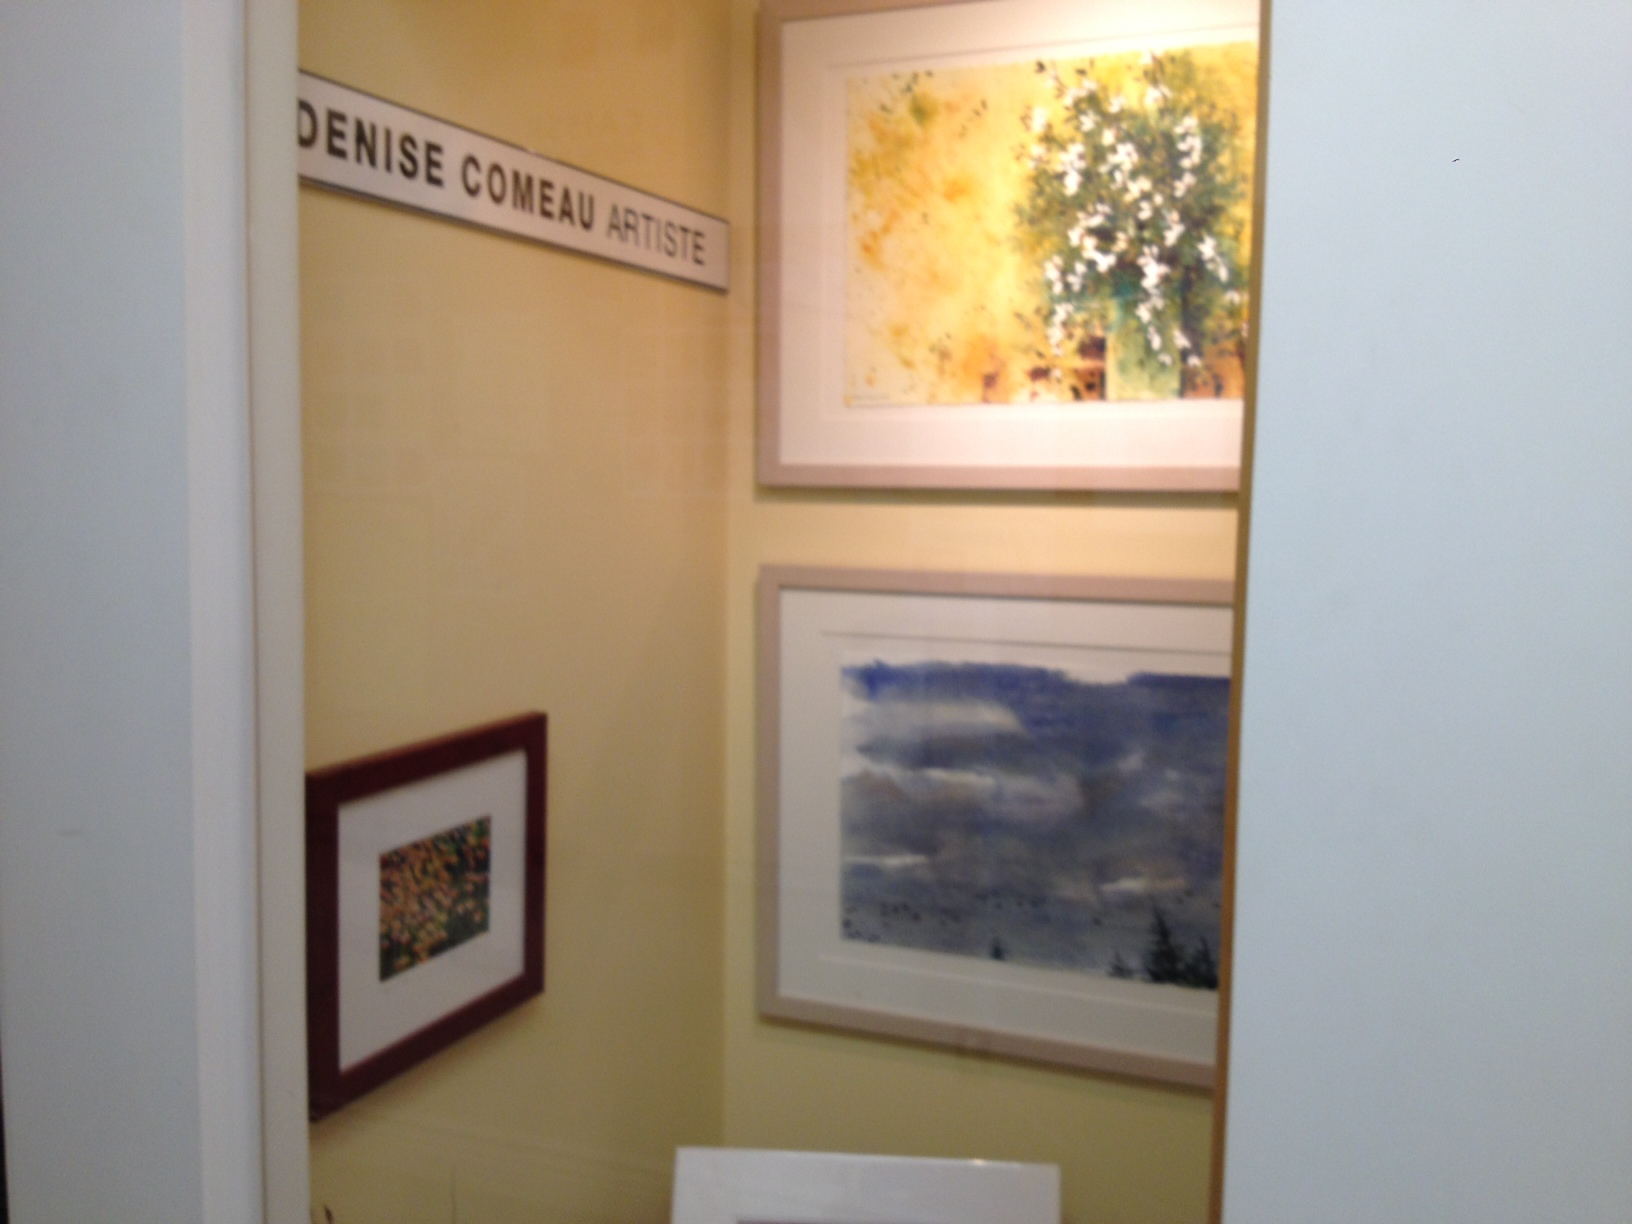 Denise Comeau artiste